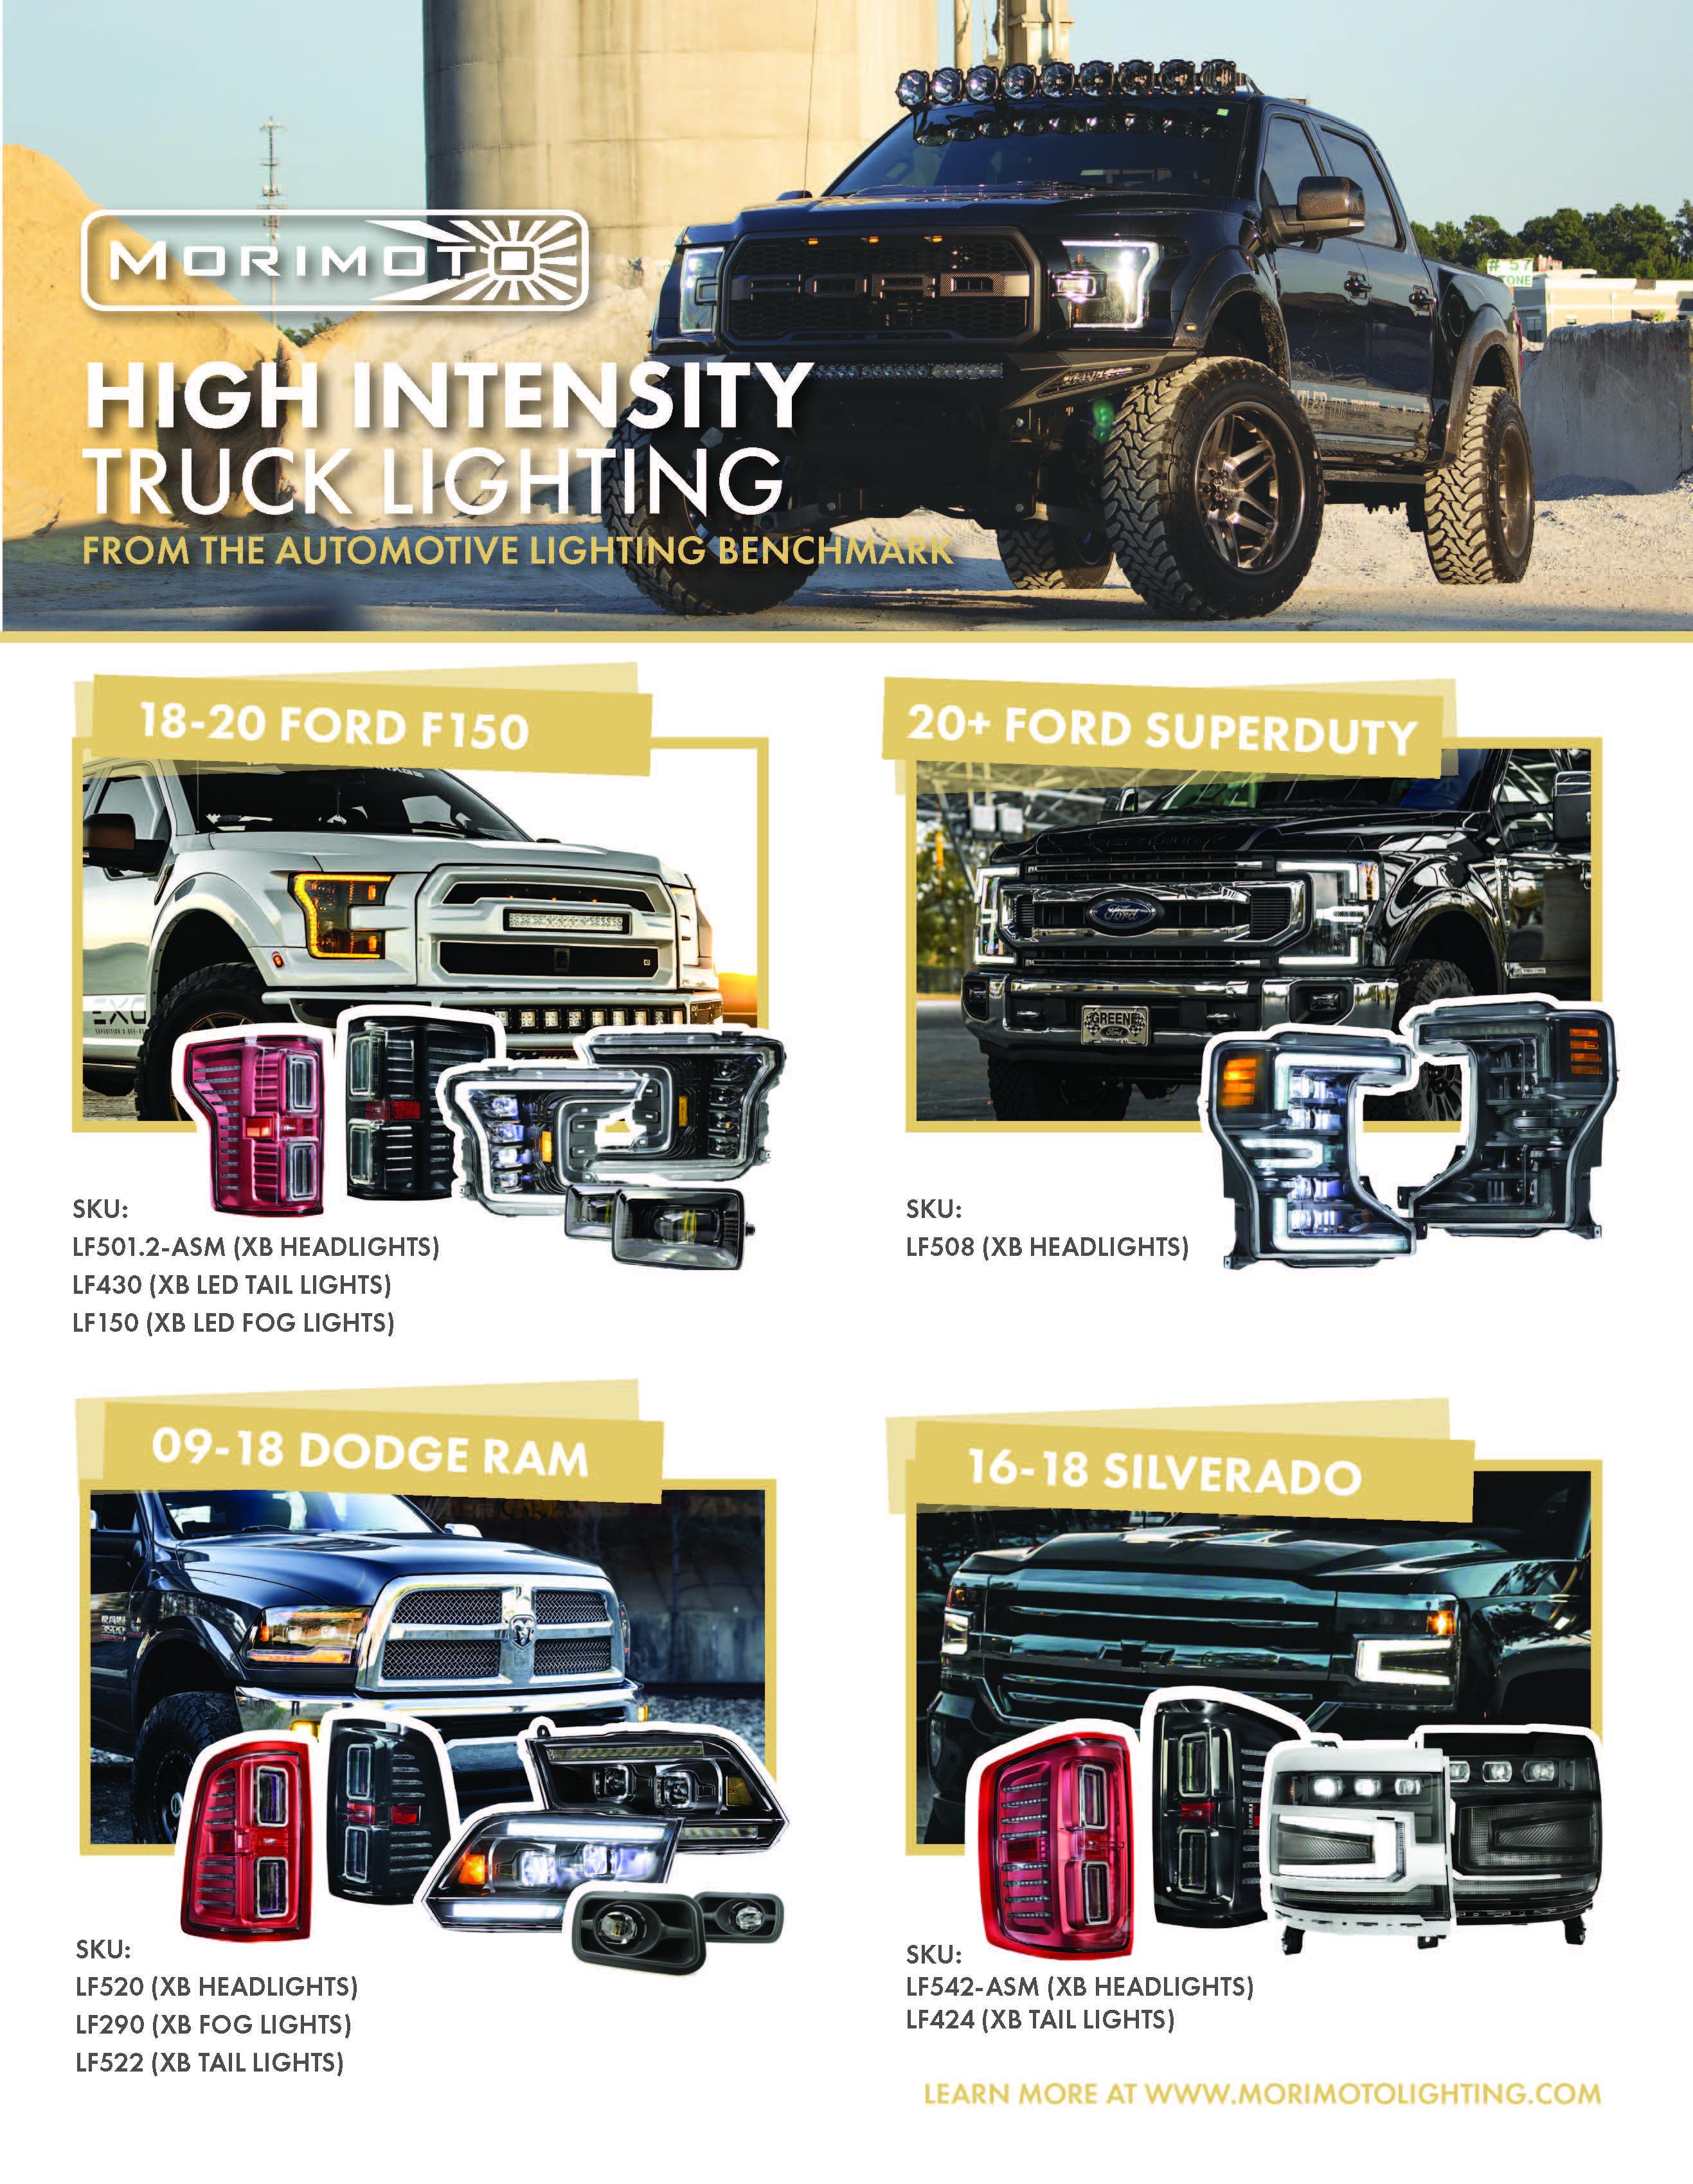 Morimoto: High Intensity Truck Lighting